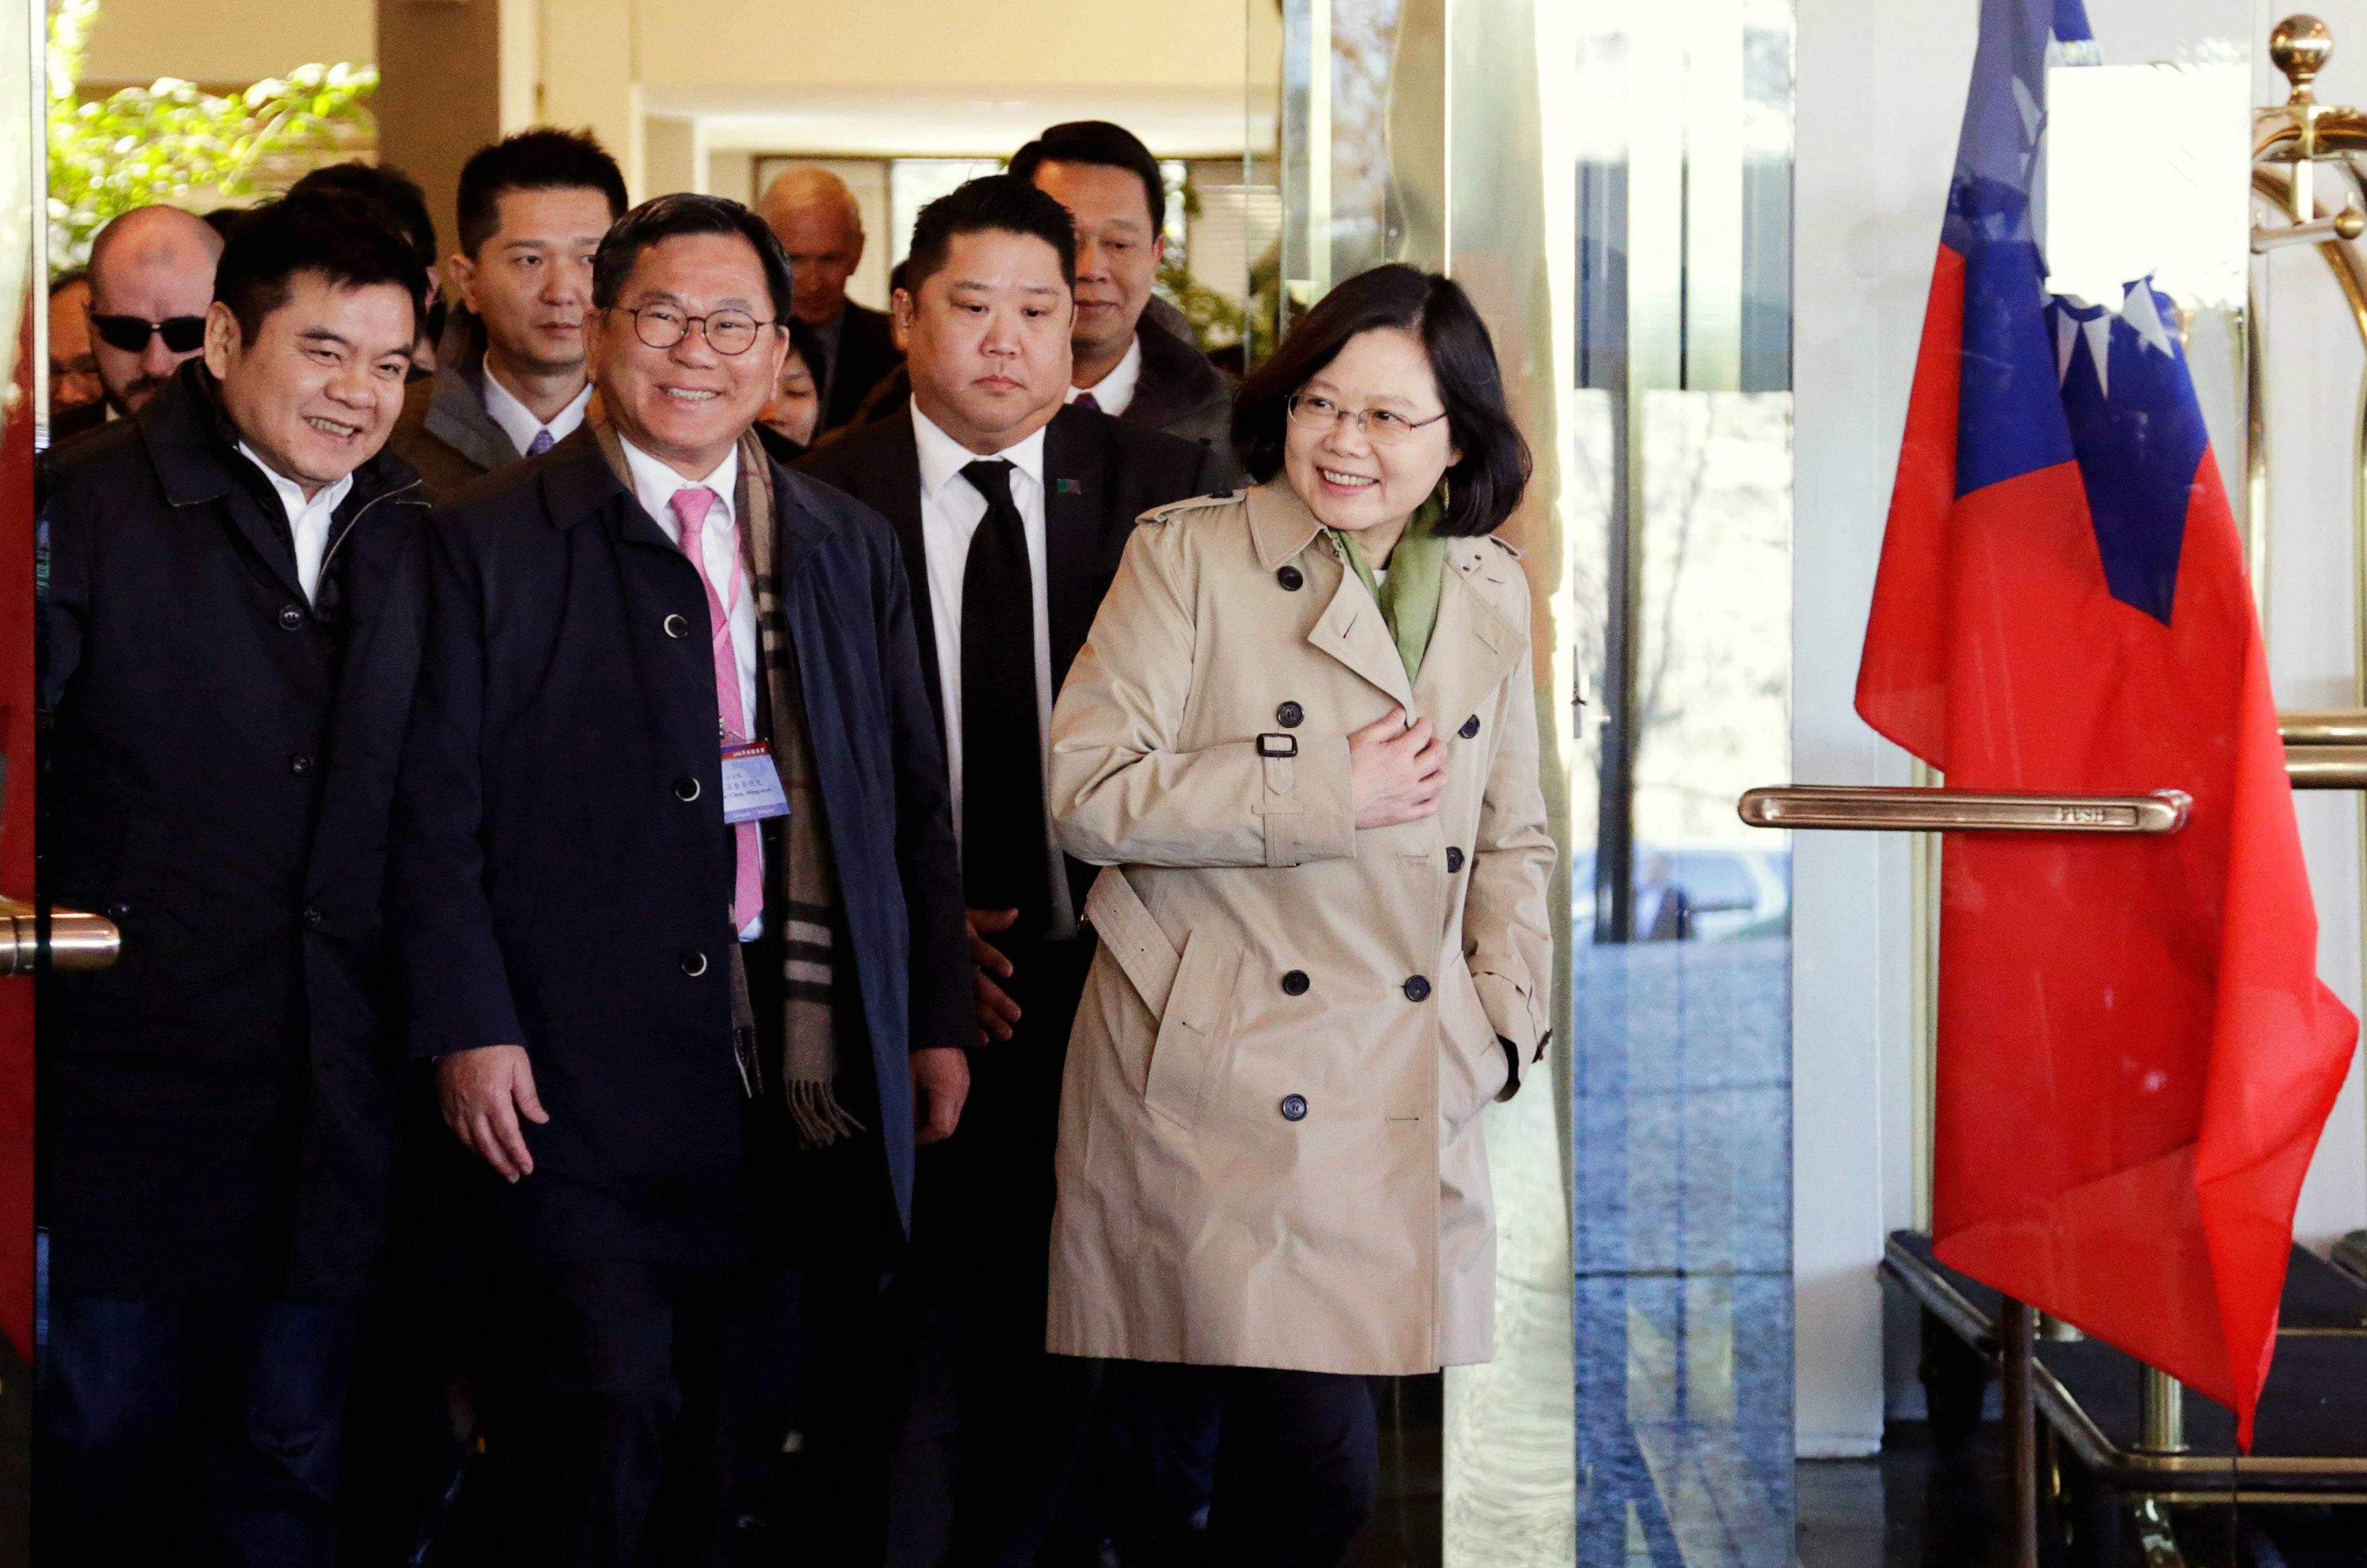 Taiwan President Tsai Ingwen visiting Texas